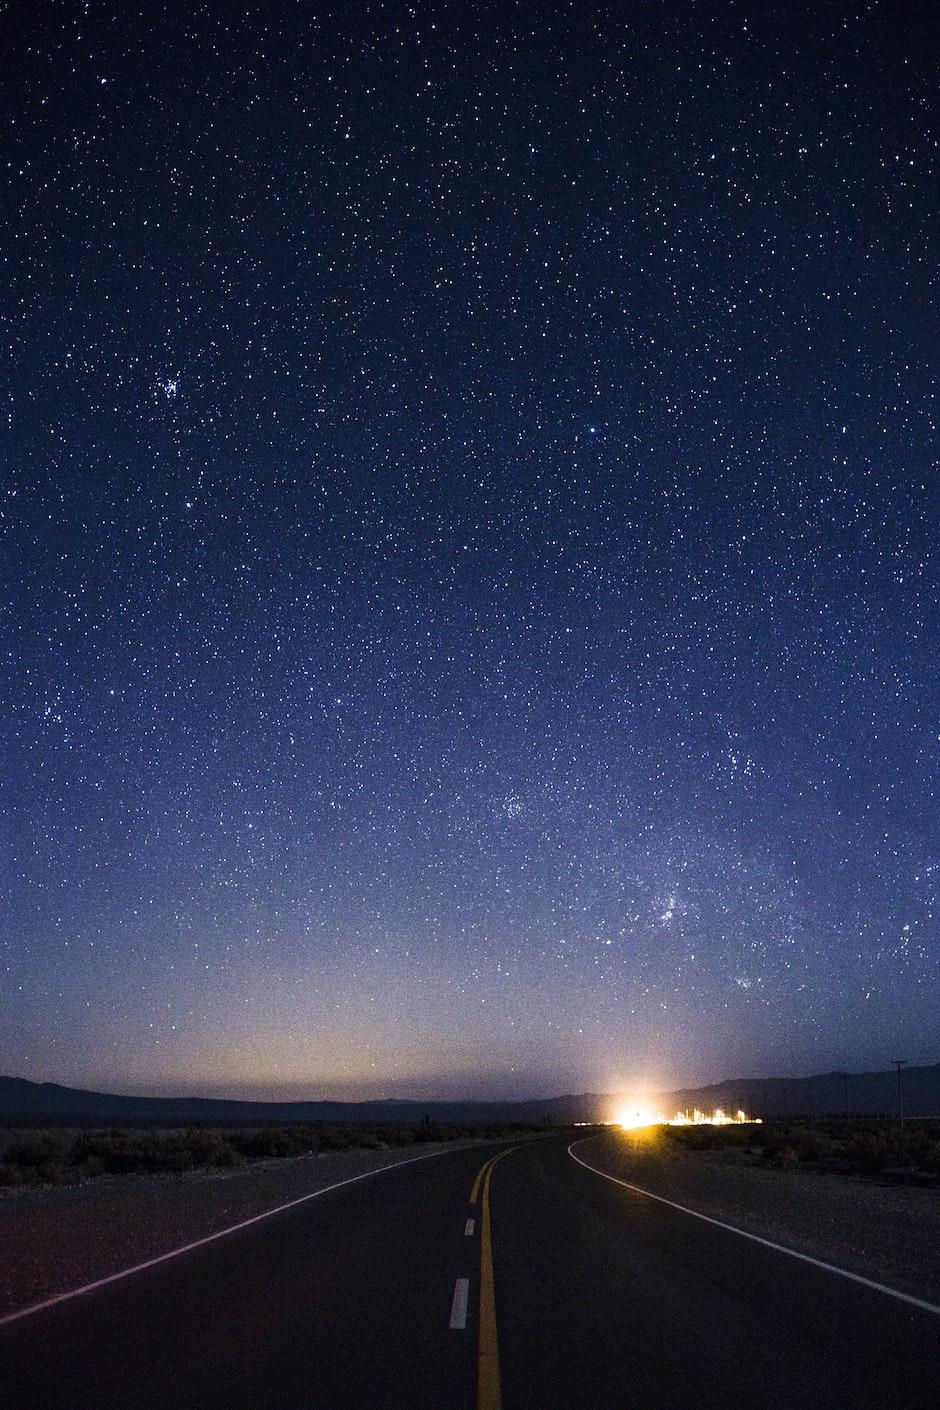 astronomy, clouds, dark